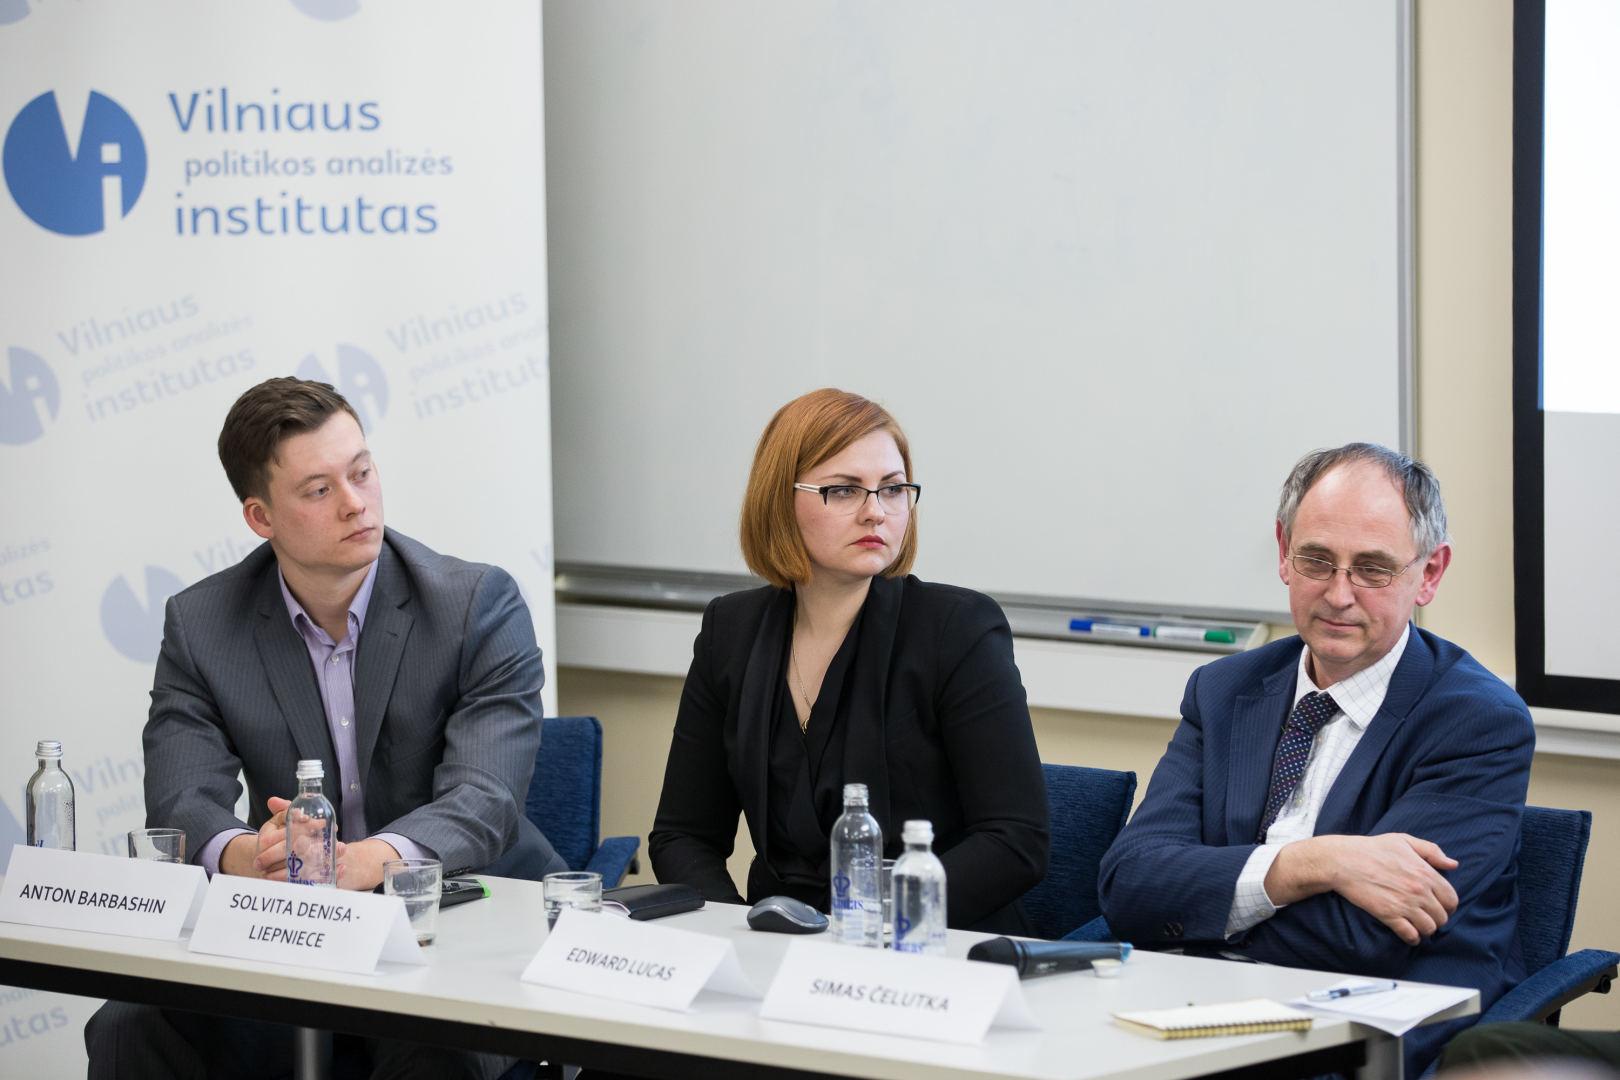 Vilniaus politikos analizės institutas (VPAI) | TEMA | 15min.lt